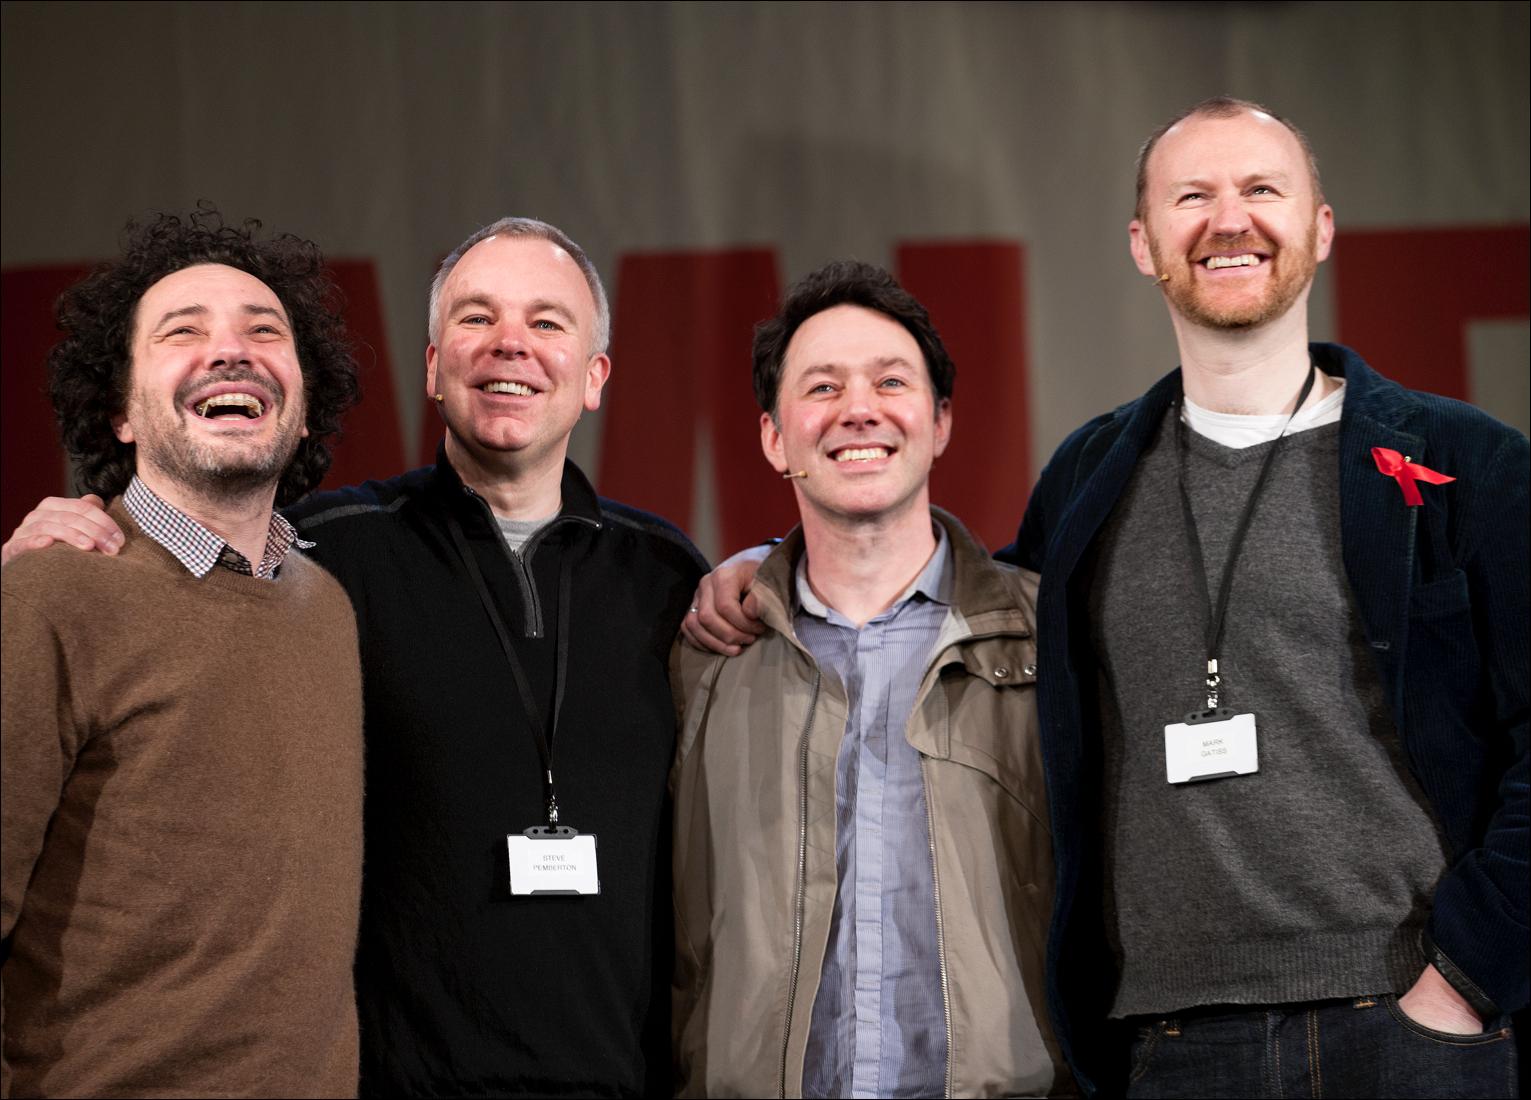 Jeremy Dyson, Steve Pemberton, Reece Shearsmith and Mark Gatiss